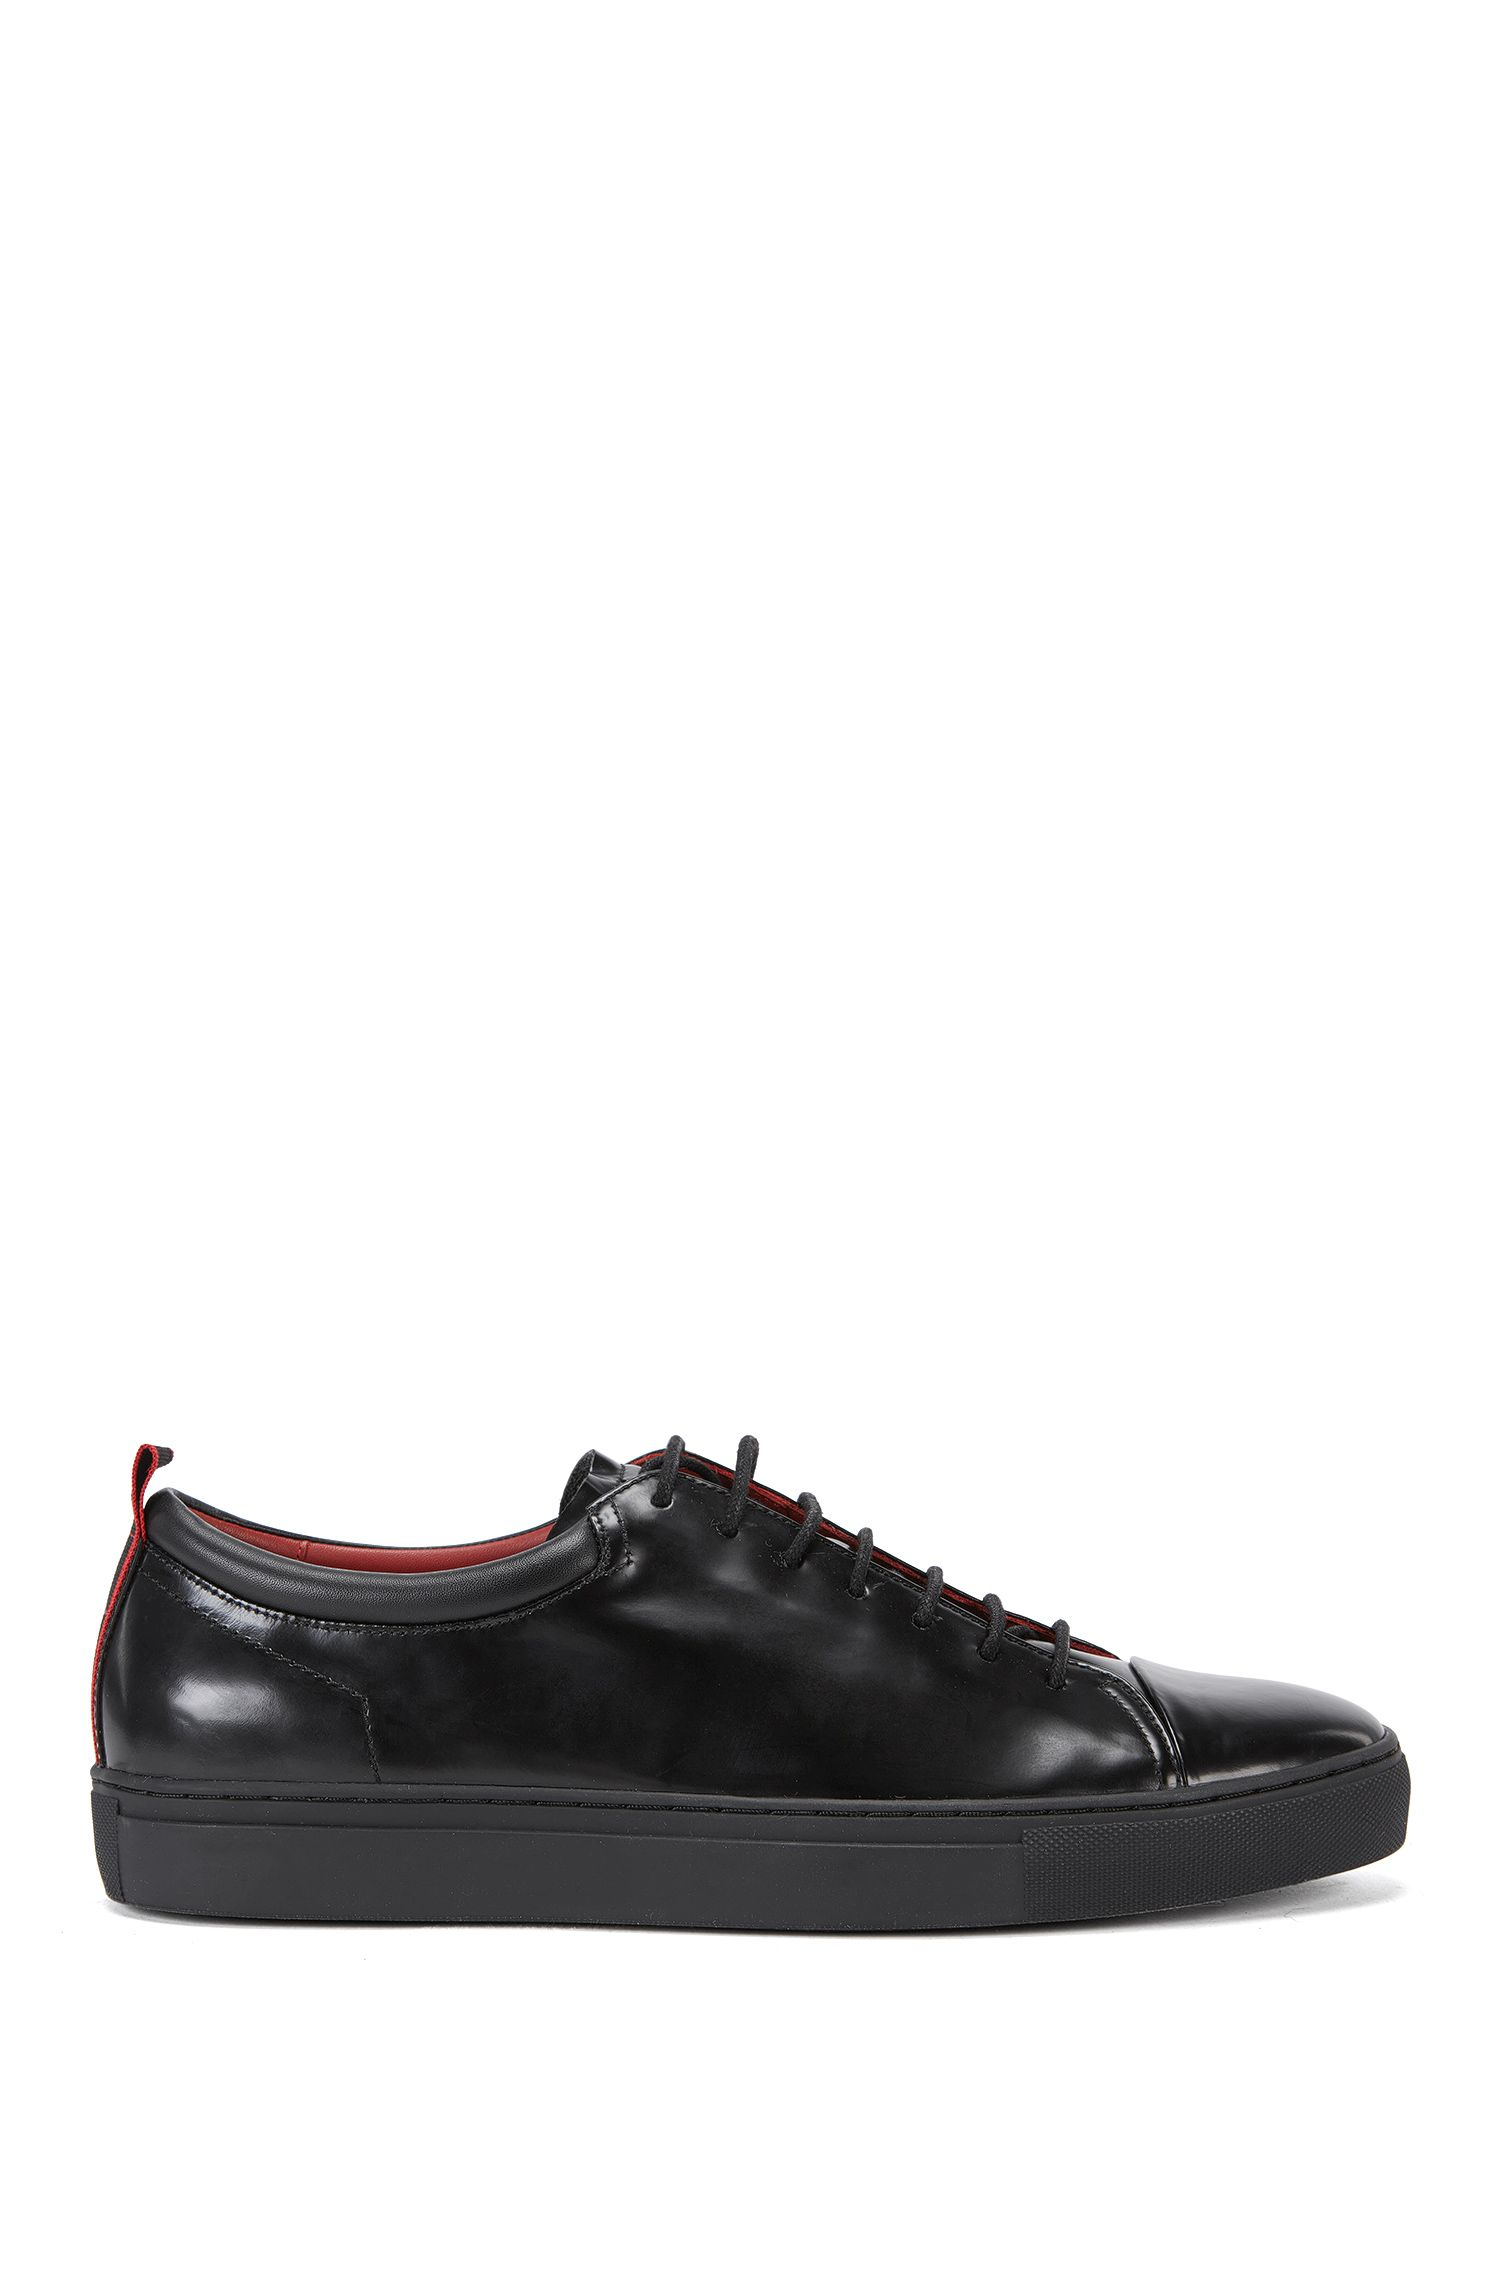 Leather Tennis Shoe   Casual Fut Tenn Boct, Black